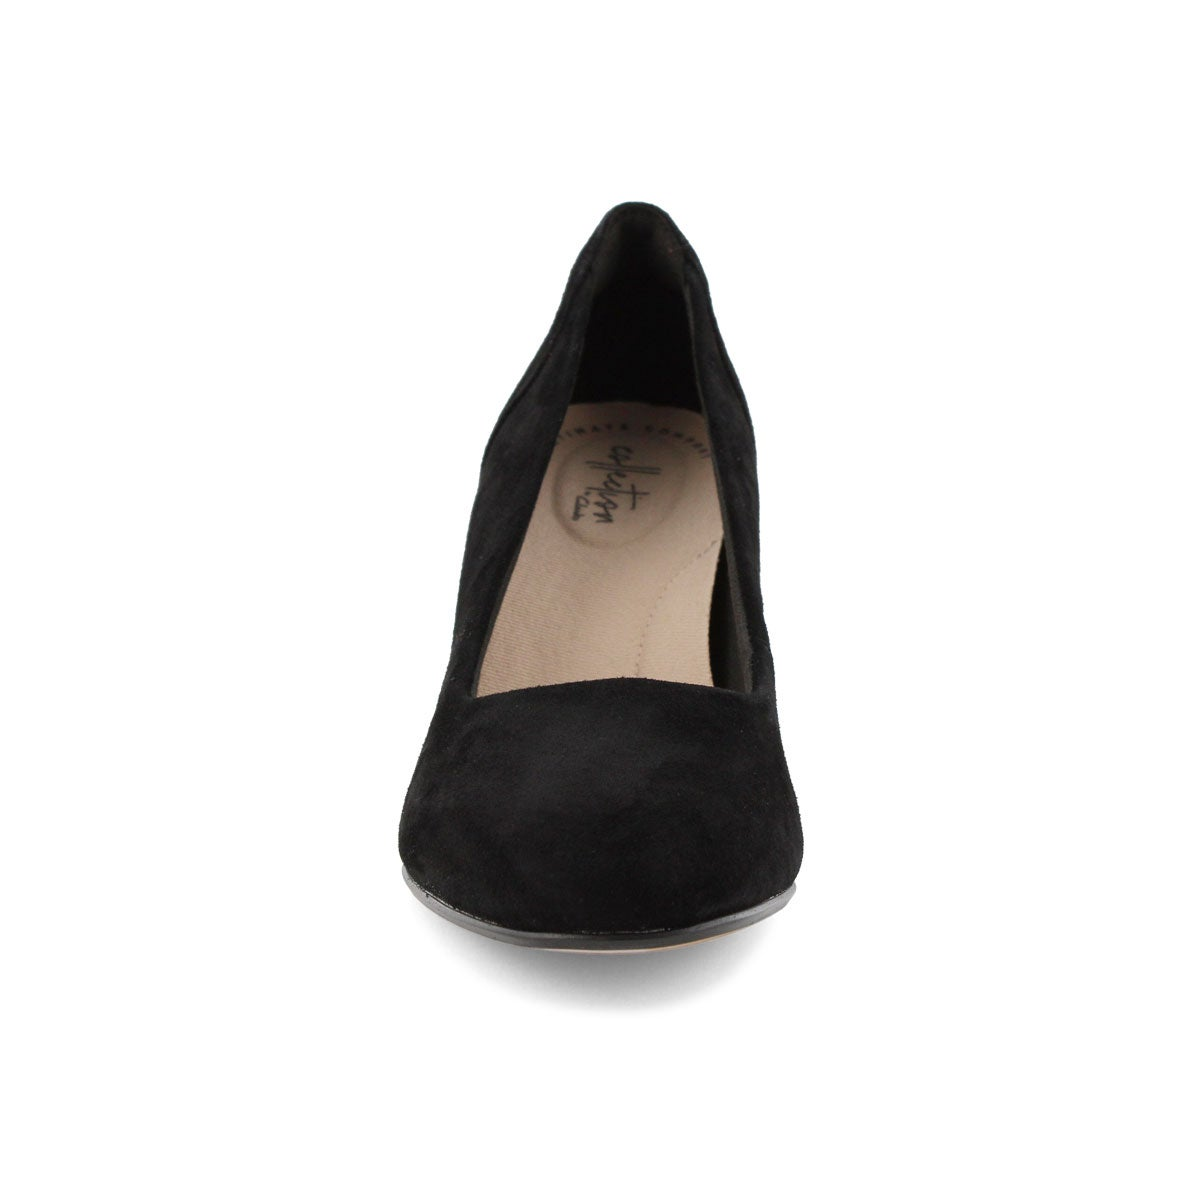 Lds Chantelle Ava black dress heel